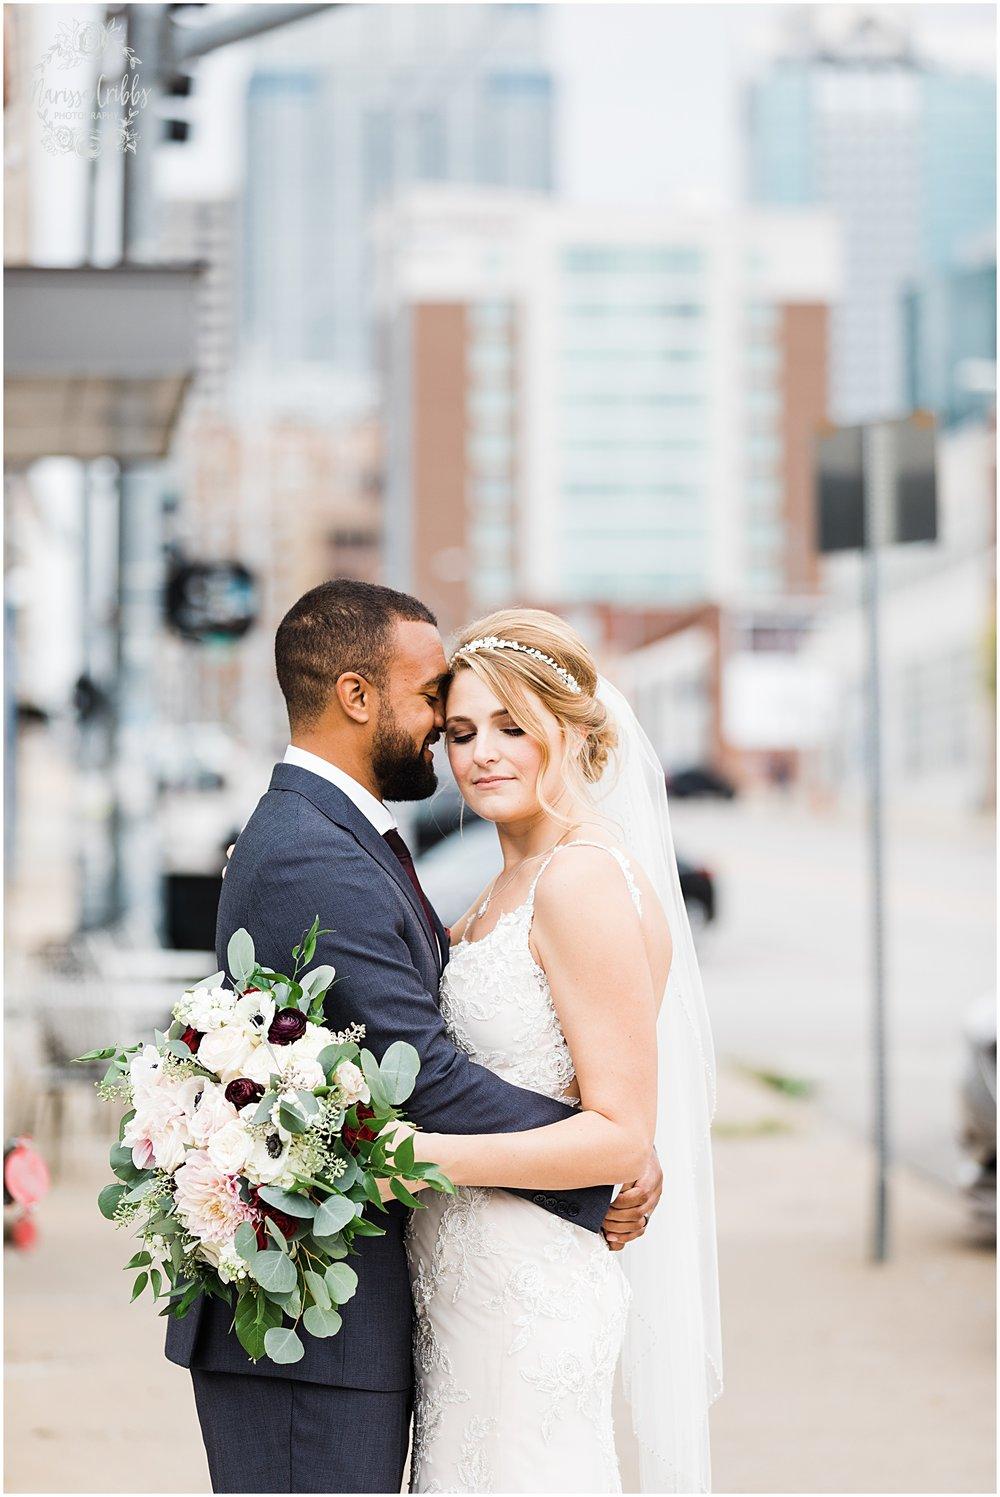 BAUER WEDDING   KELSEA & JUSTIN   MARISSA CRIBBS PHOTOGRAPHY_6531.jpg